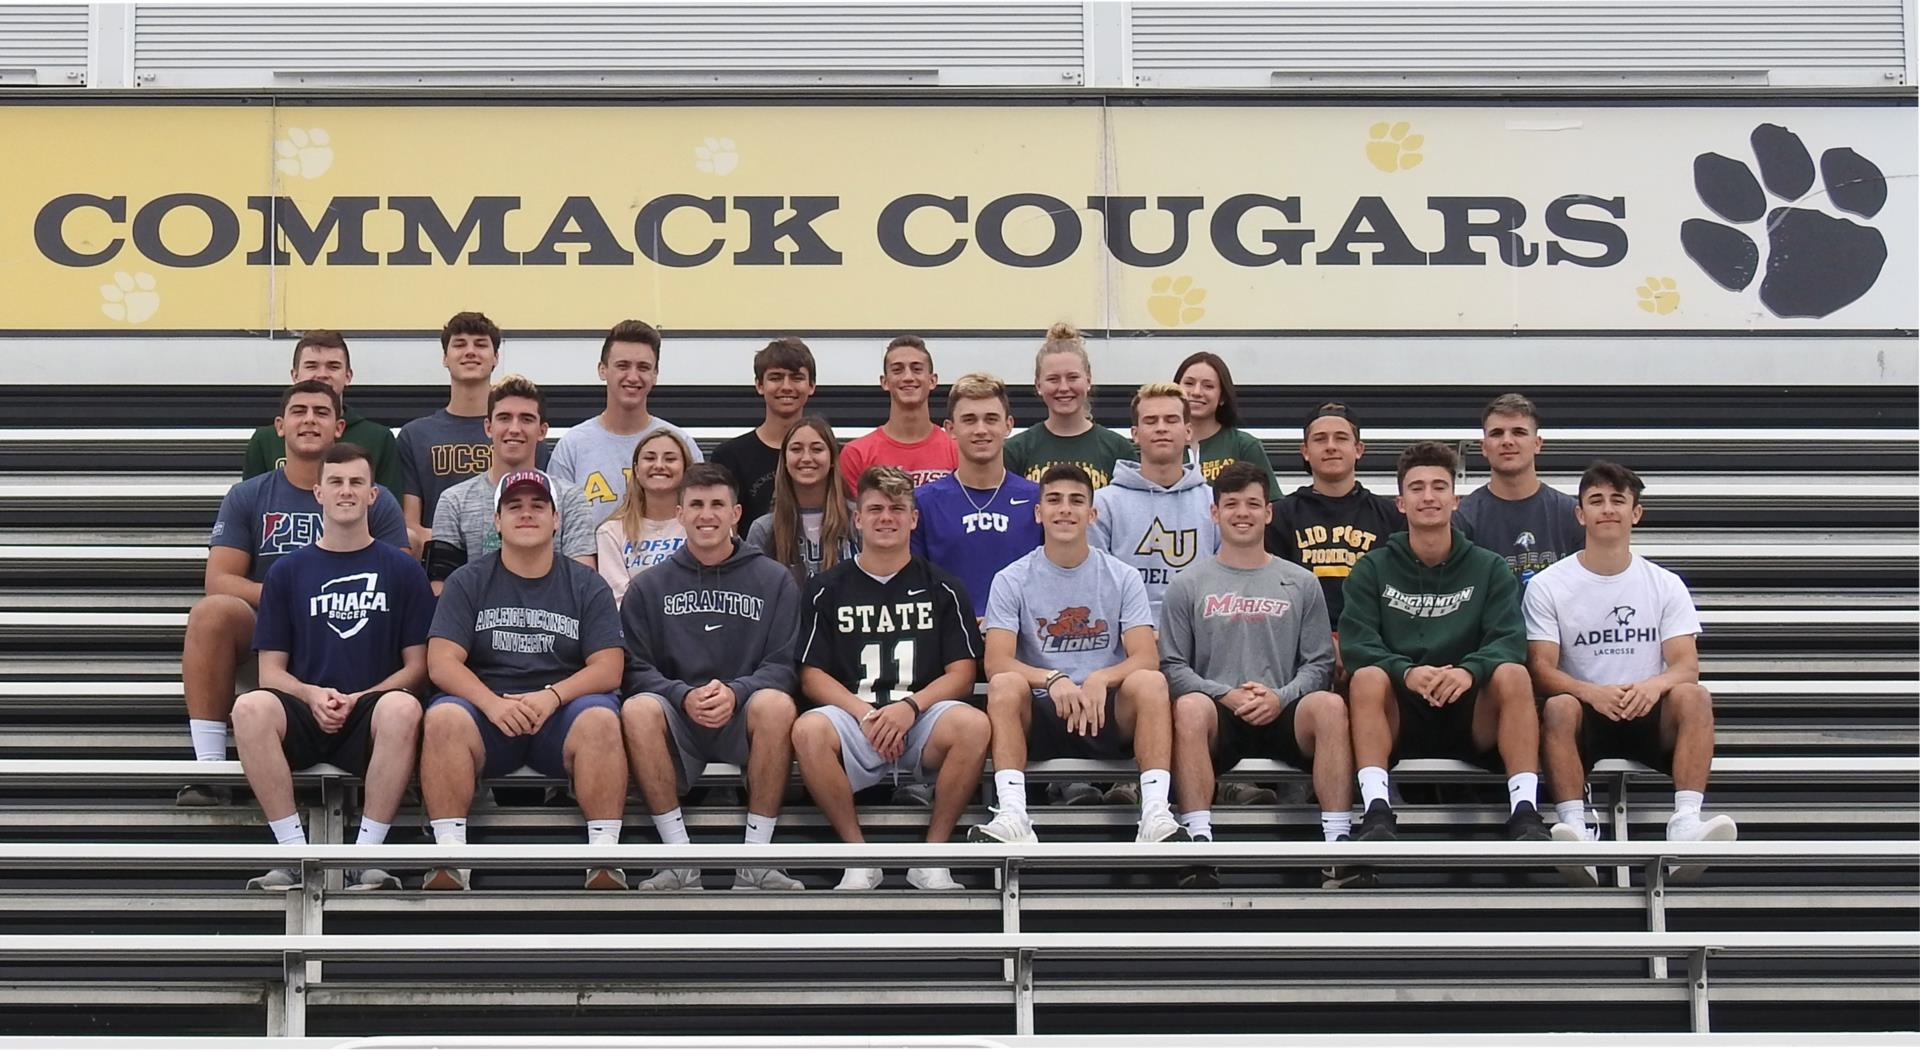 Commack College Athletes